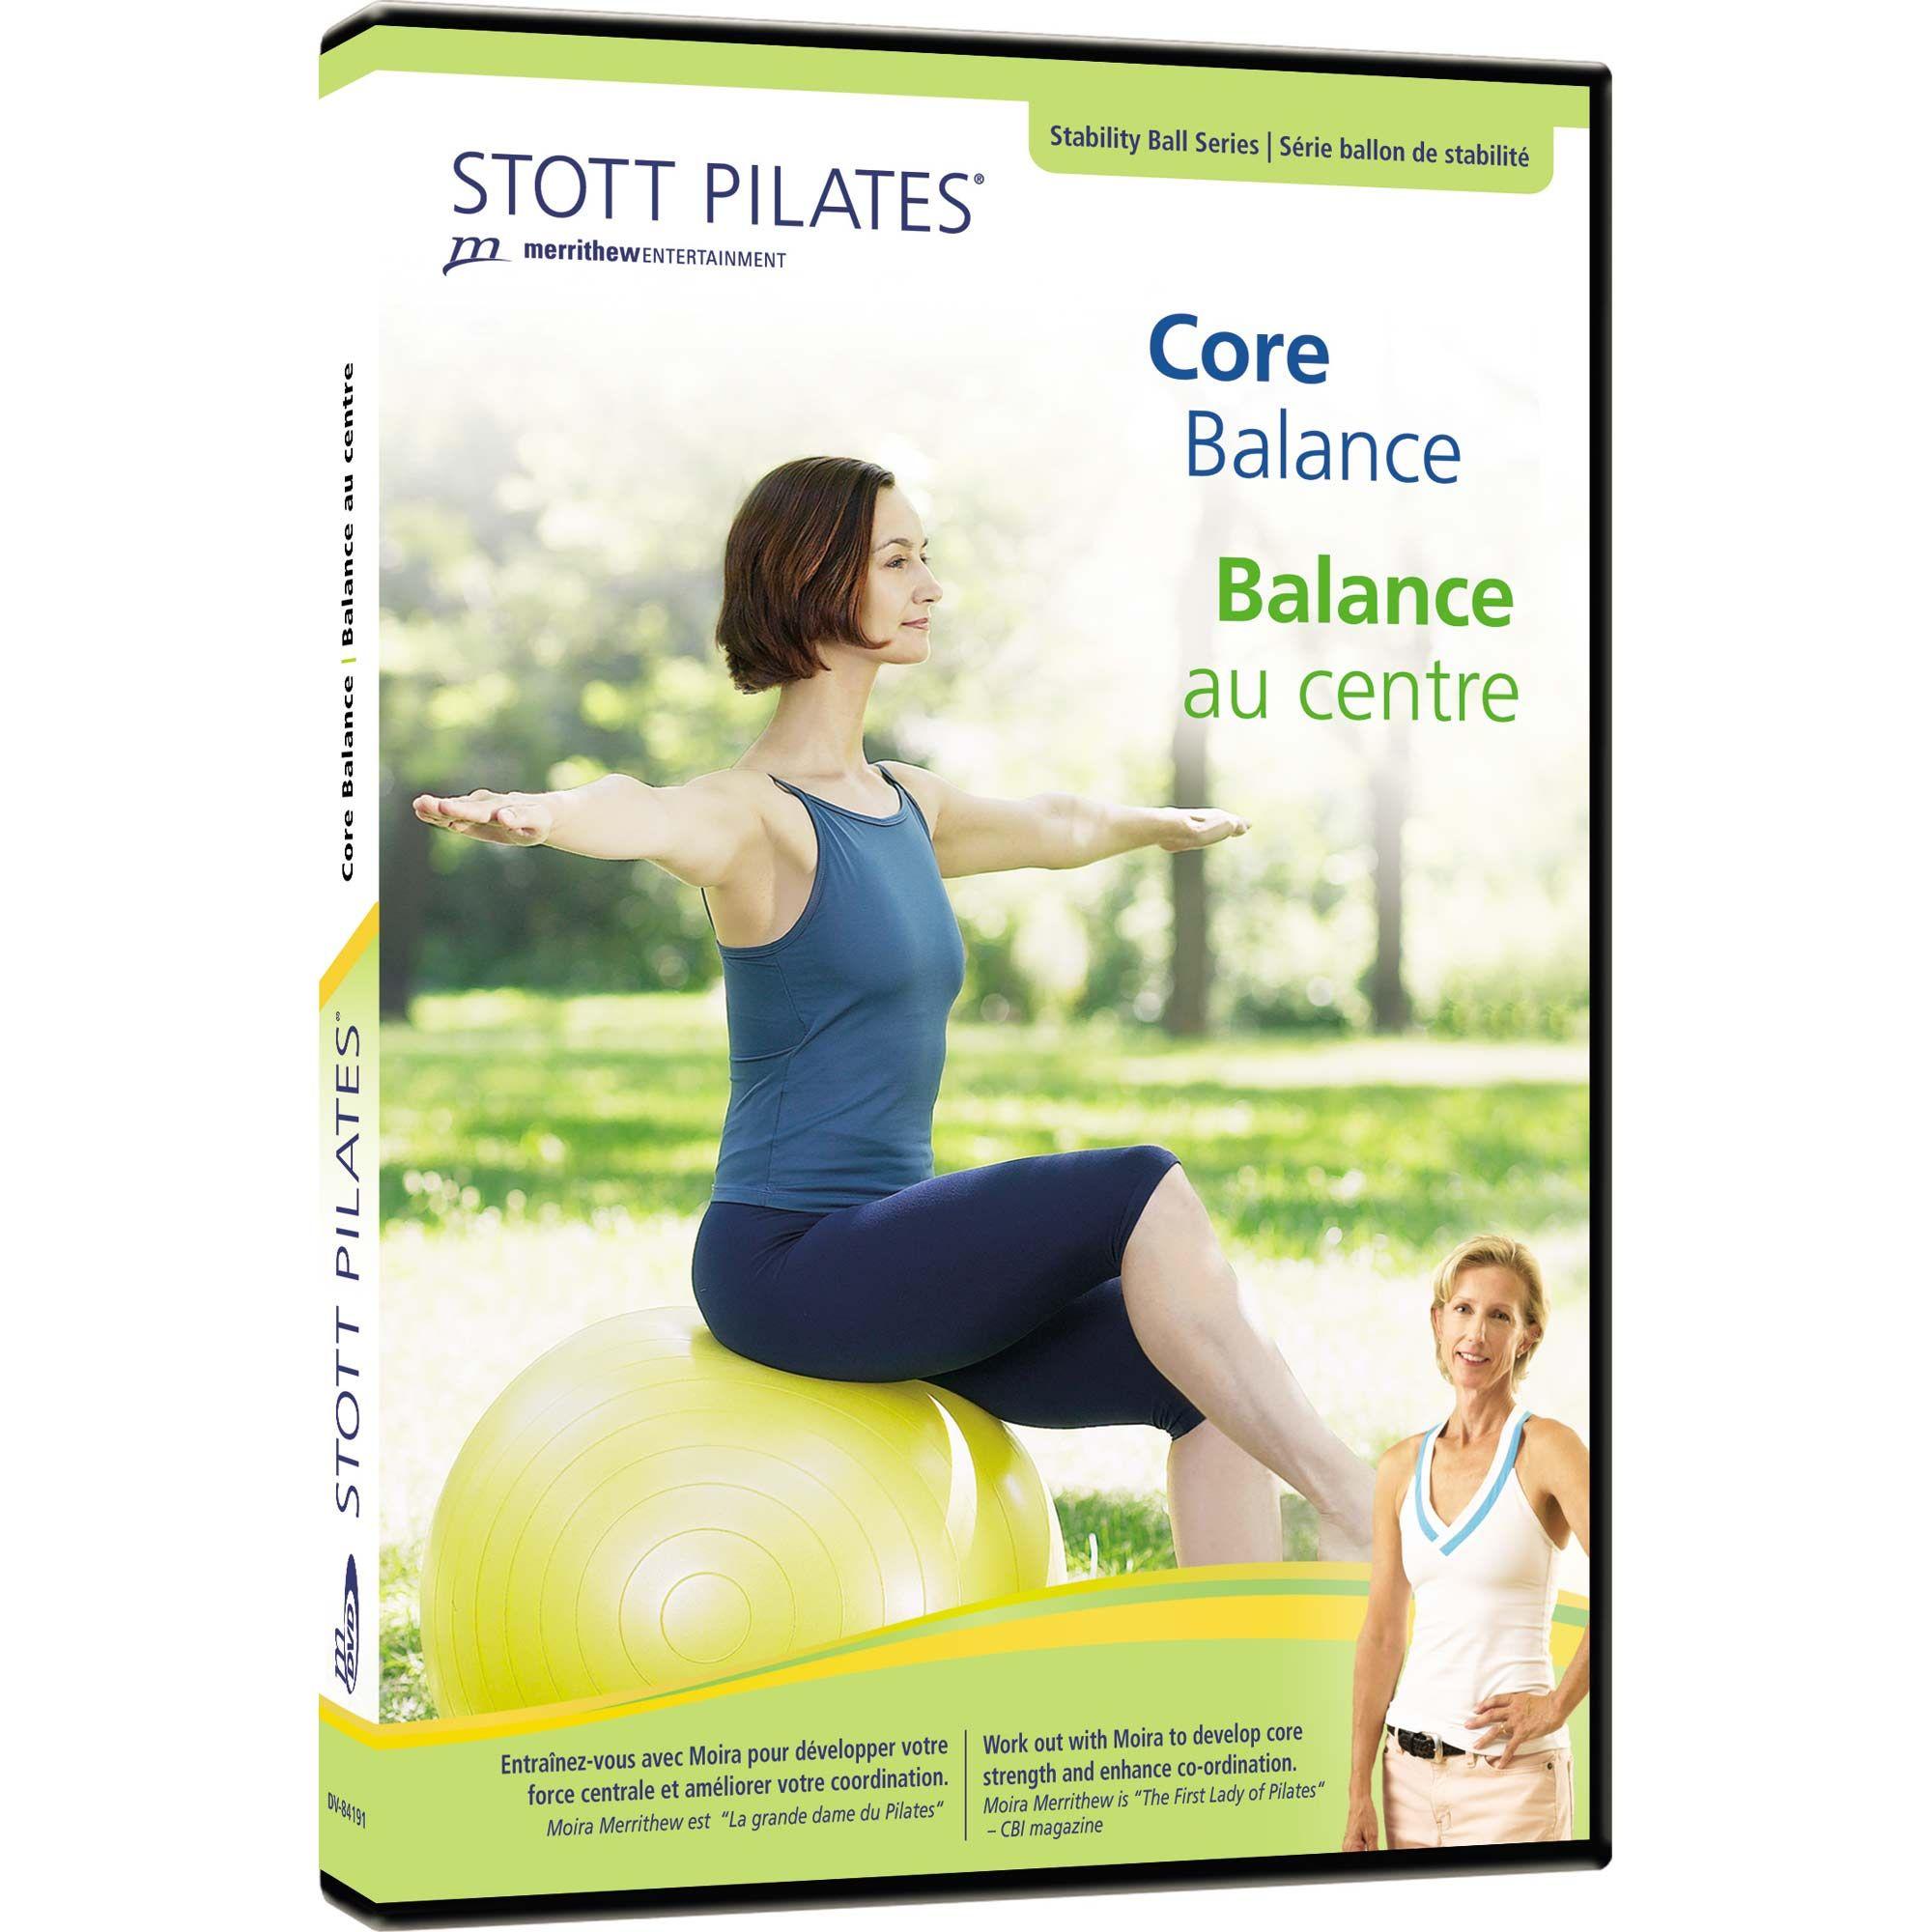 Stott Pilates Core Balance DVD